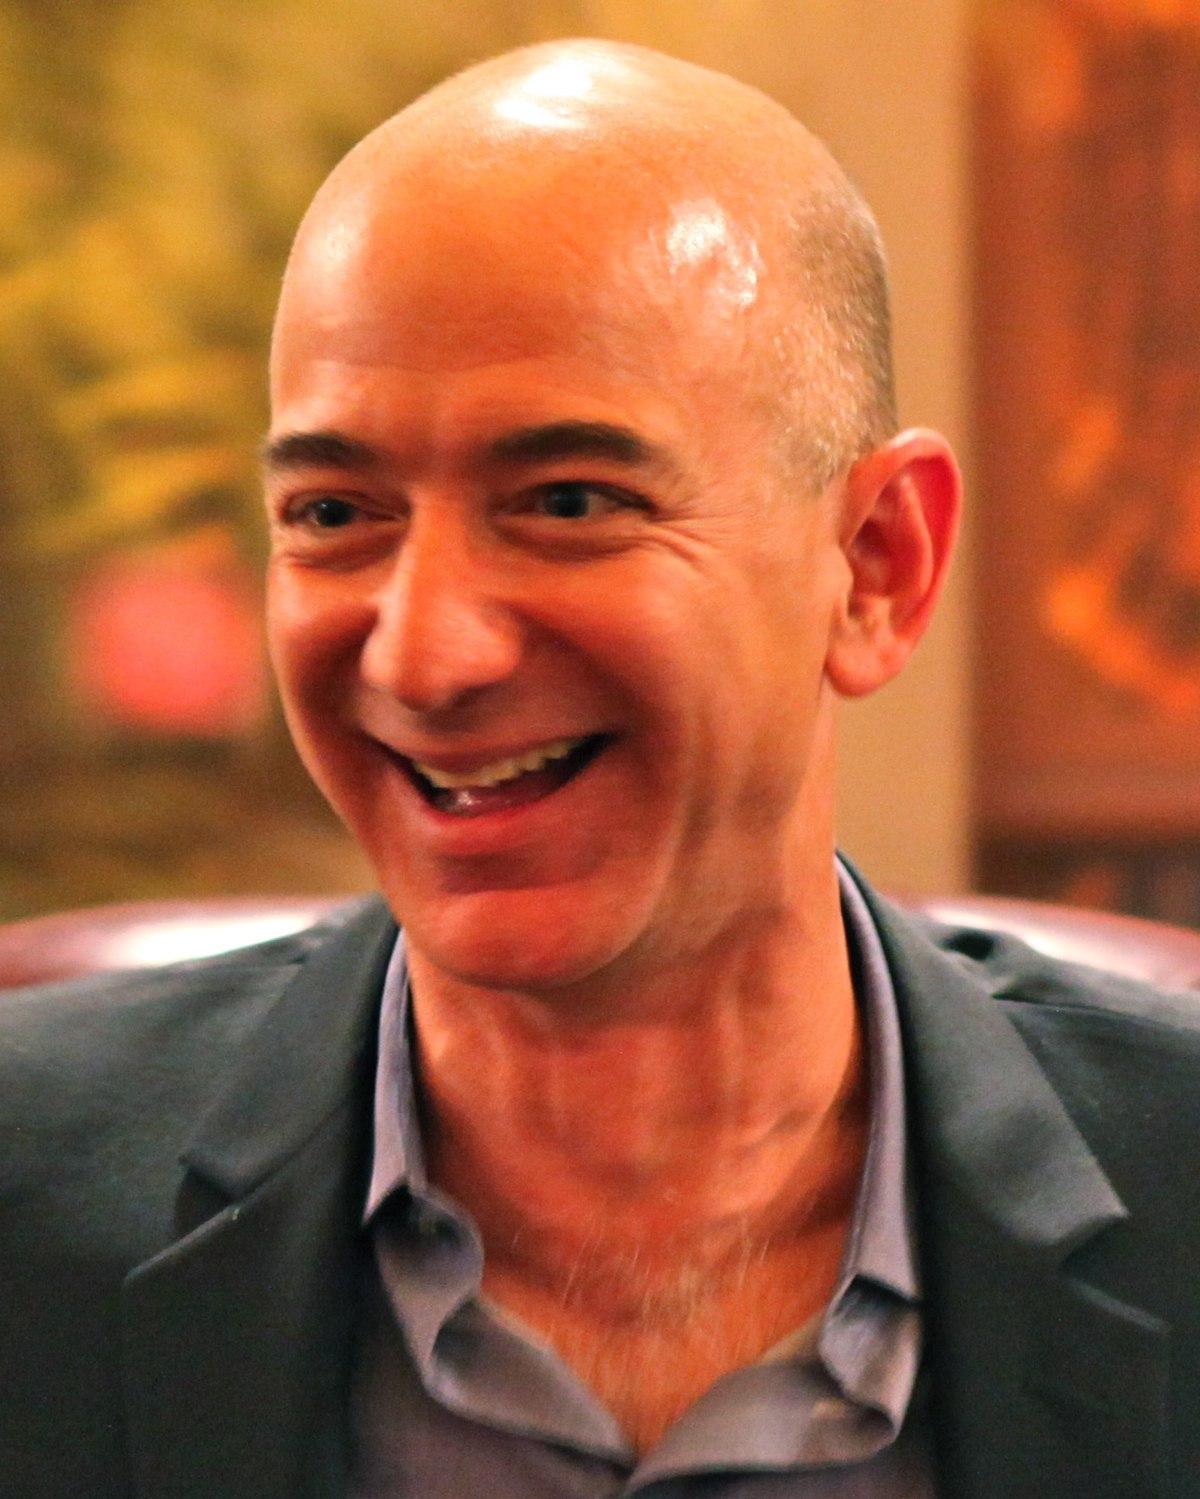 File:Jeff Bezos' iconic laugh (cropped ...